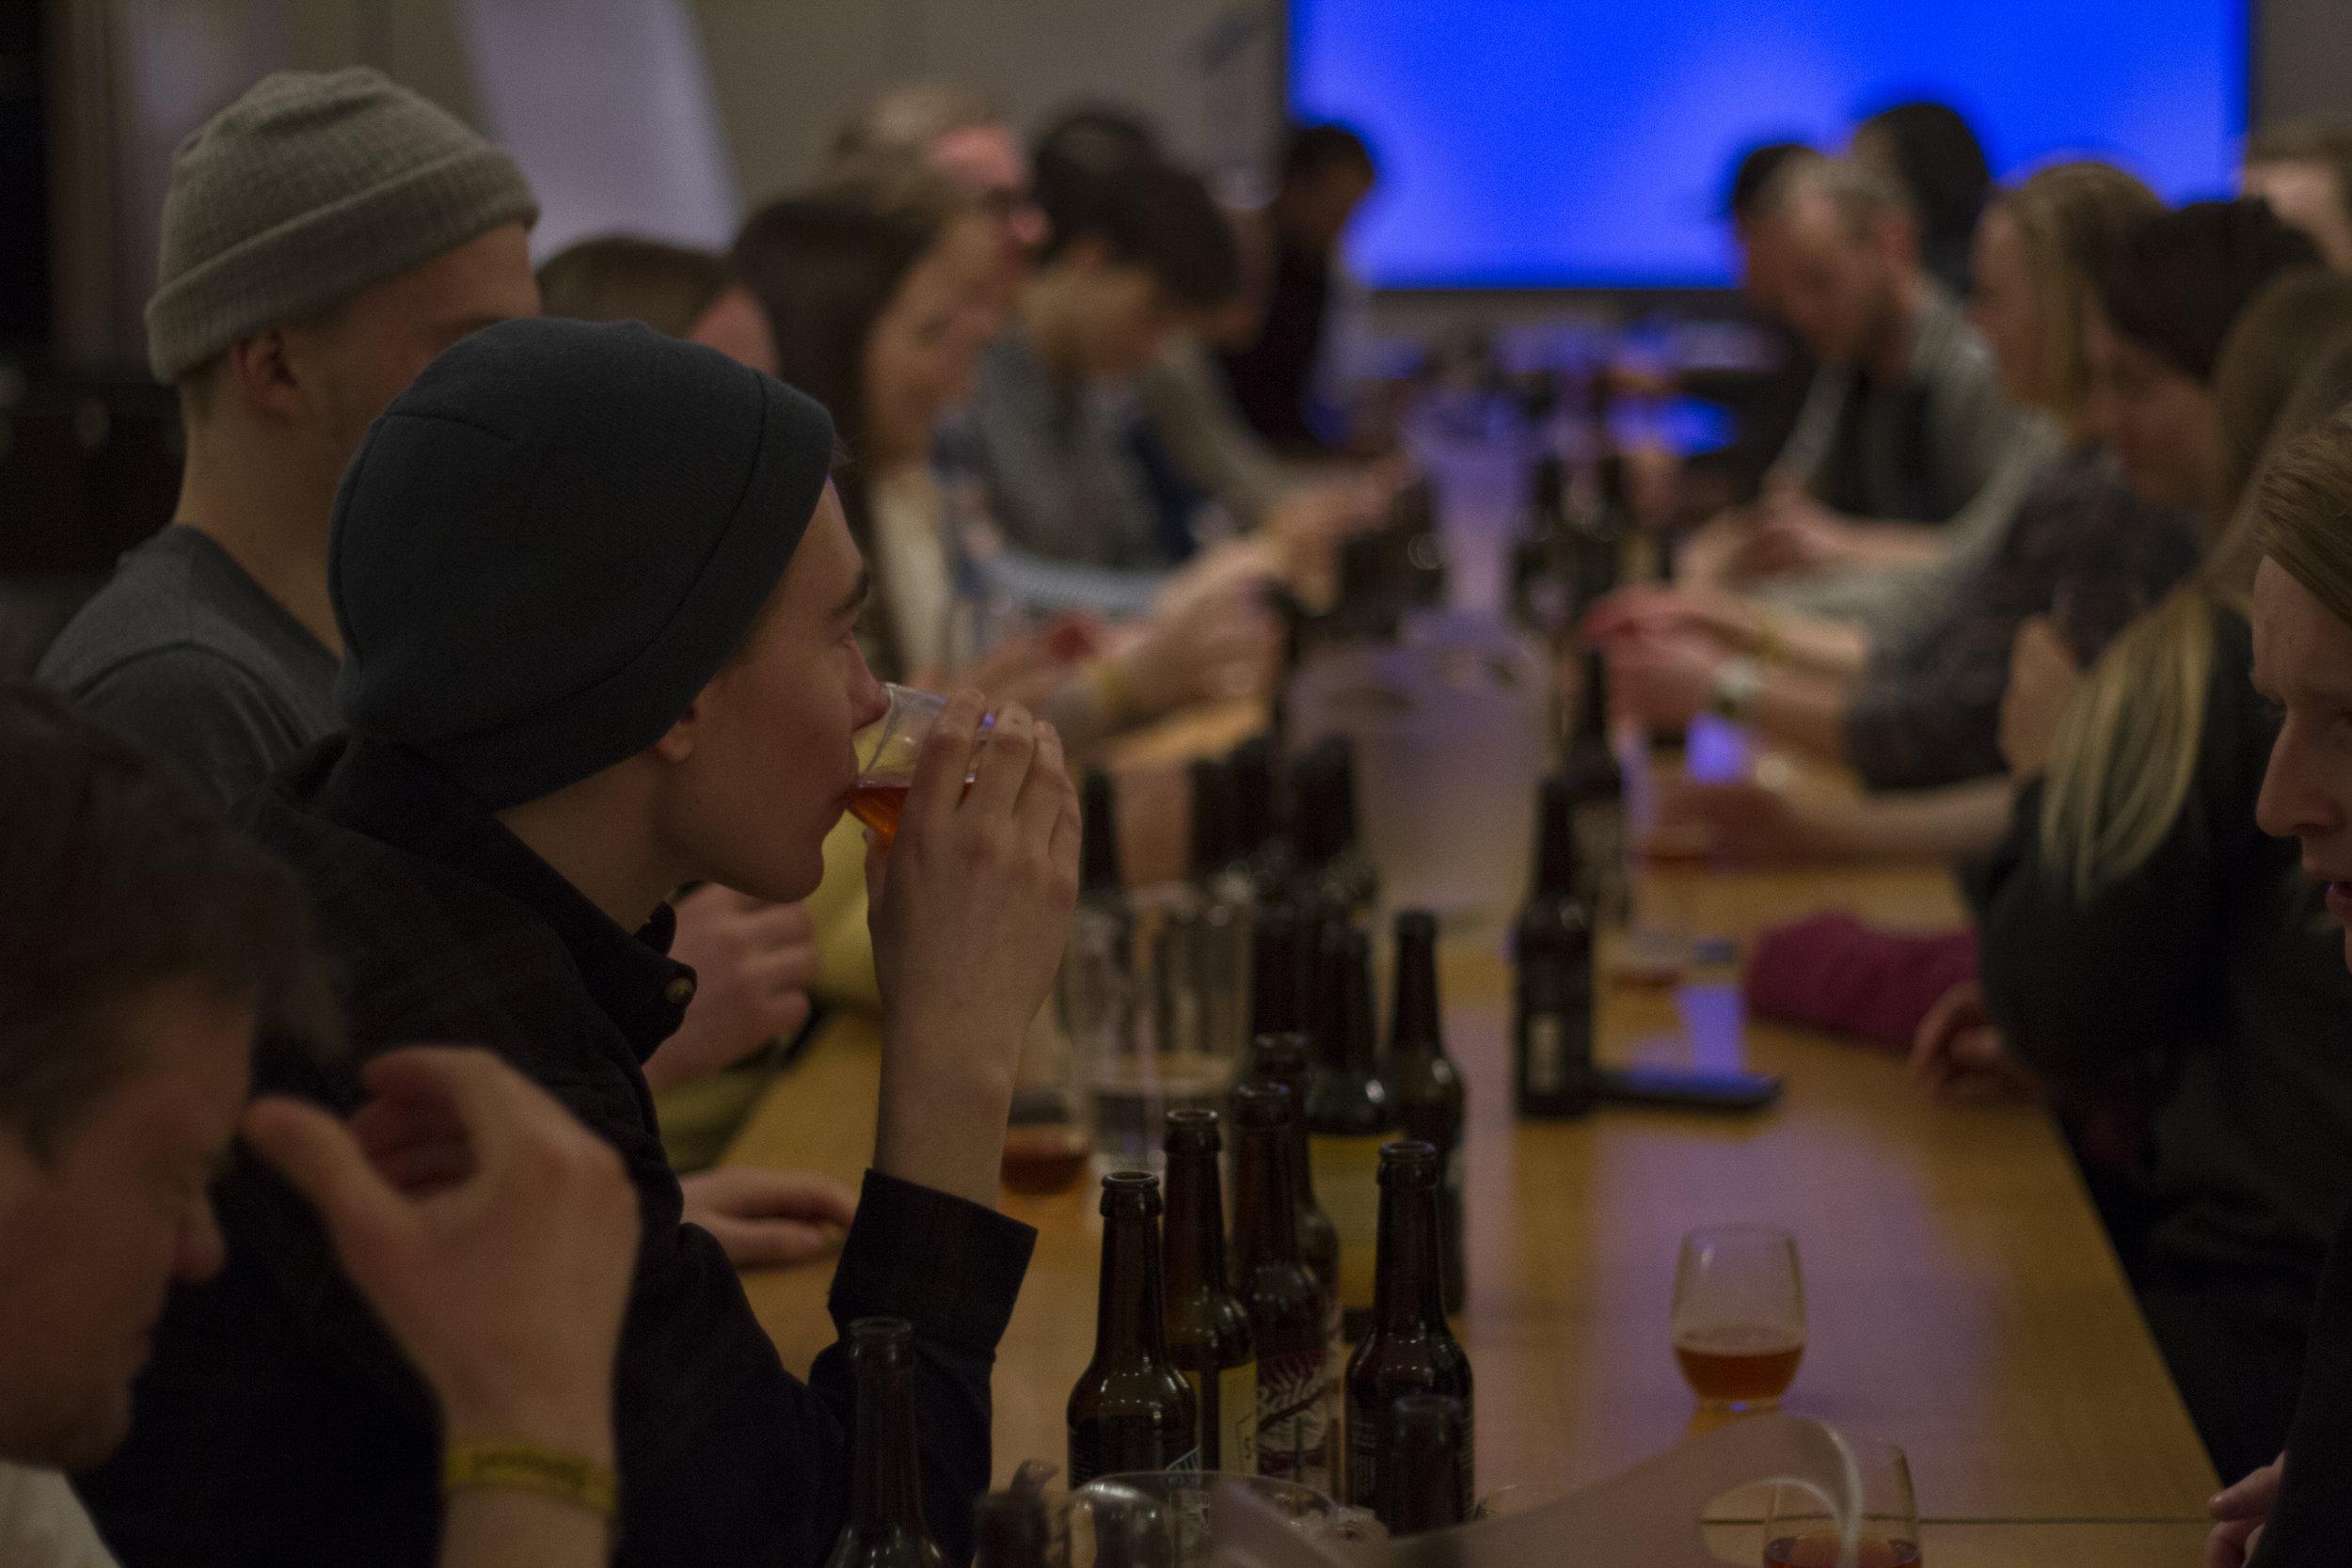 ØlsmakingMedBalder_2018_IdaFalkgjerdetSvåi_4.jpg